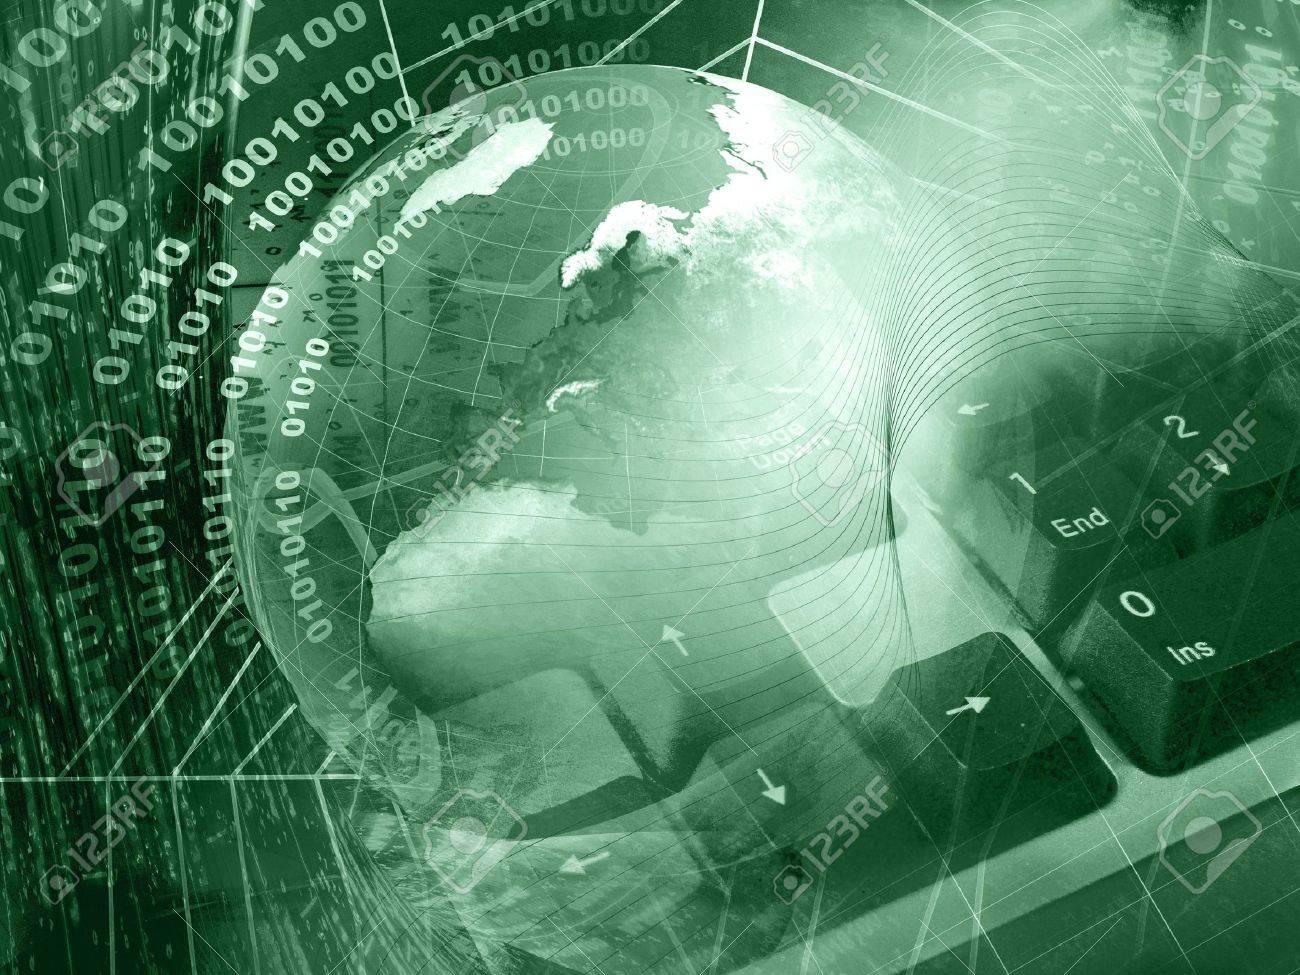 Communication background - globe and keyboard on digital background. - 8105172